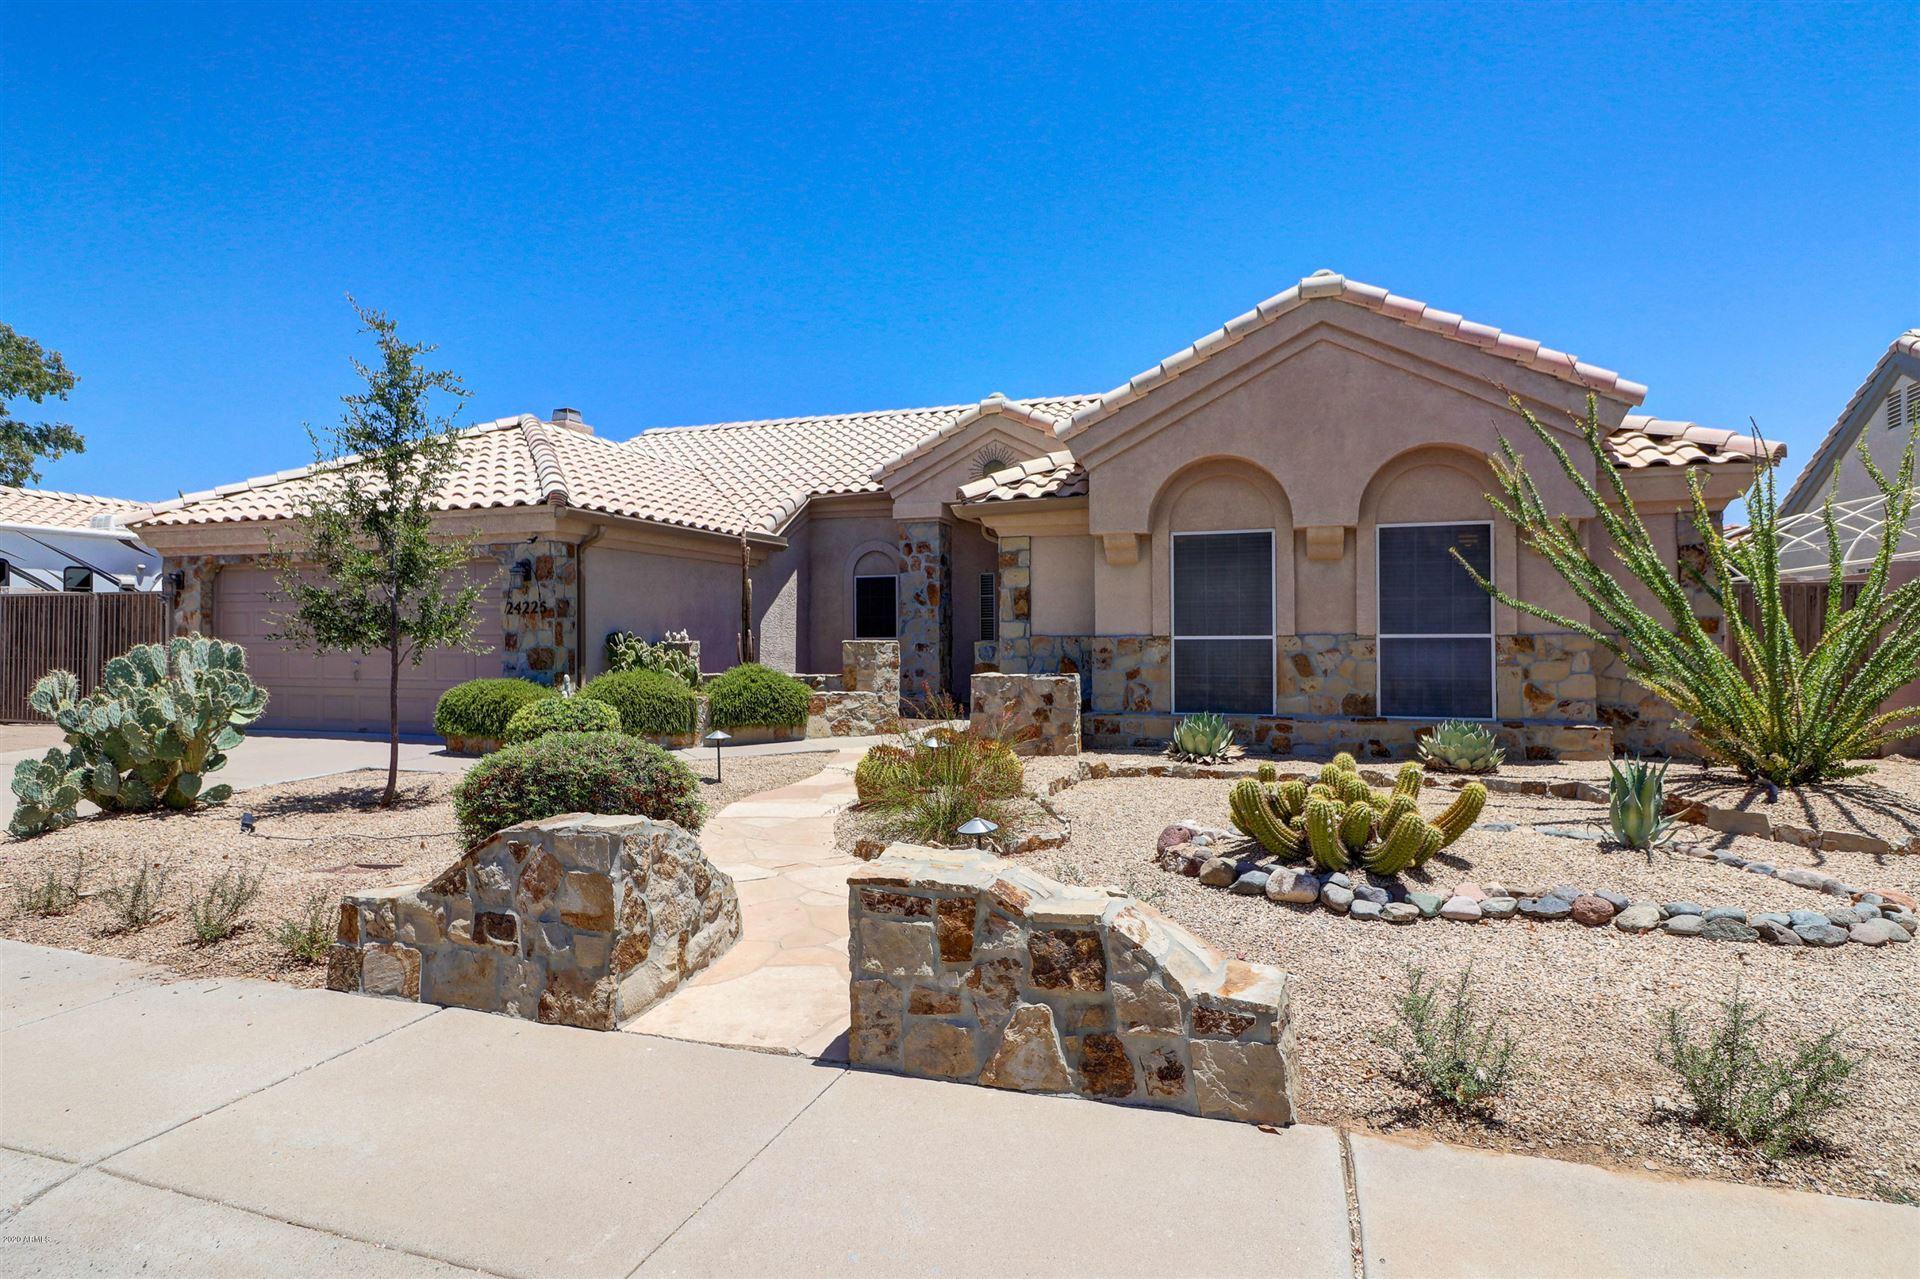 24225 N 41ST Avenue, Glendale, AZ 85310 - MLS#: 6101277